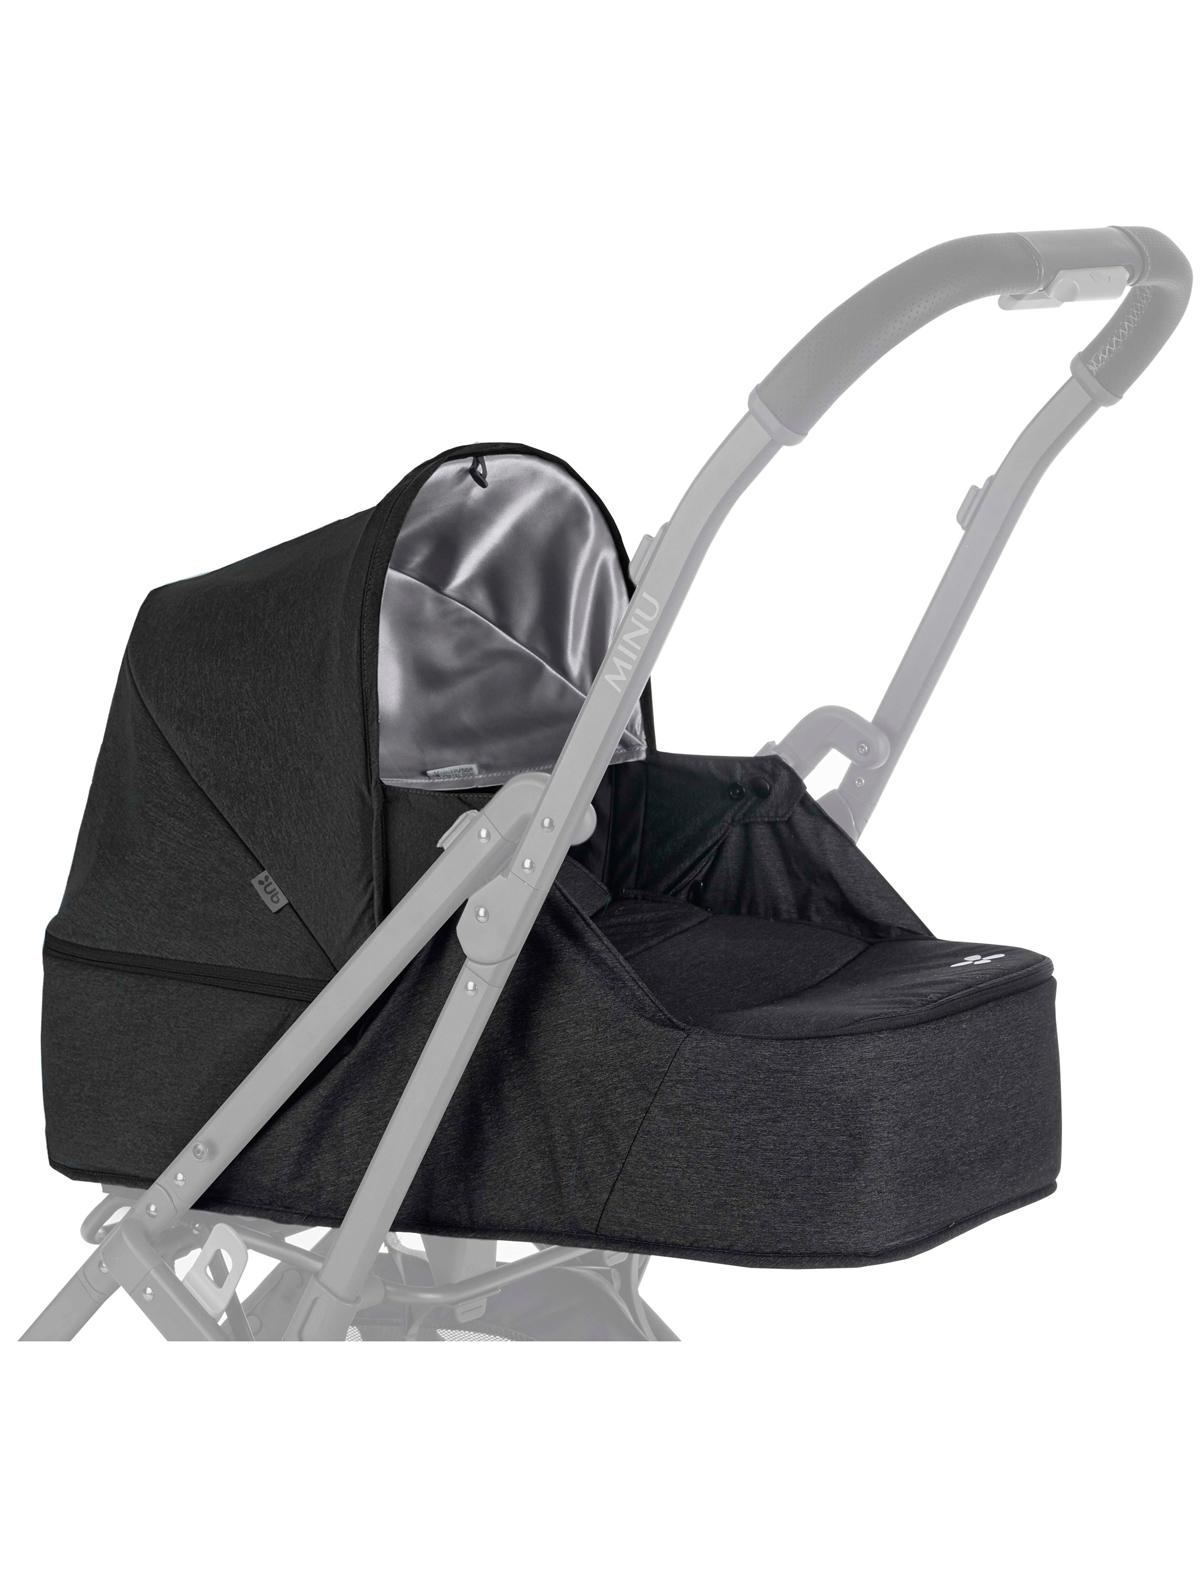 Аксессуар для коляски UPPAbaby 2152448 черного цвета